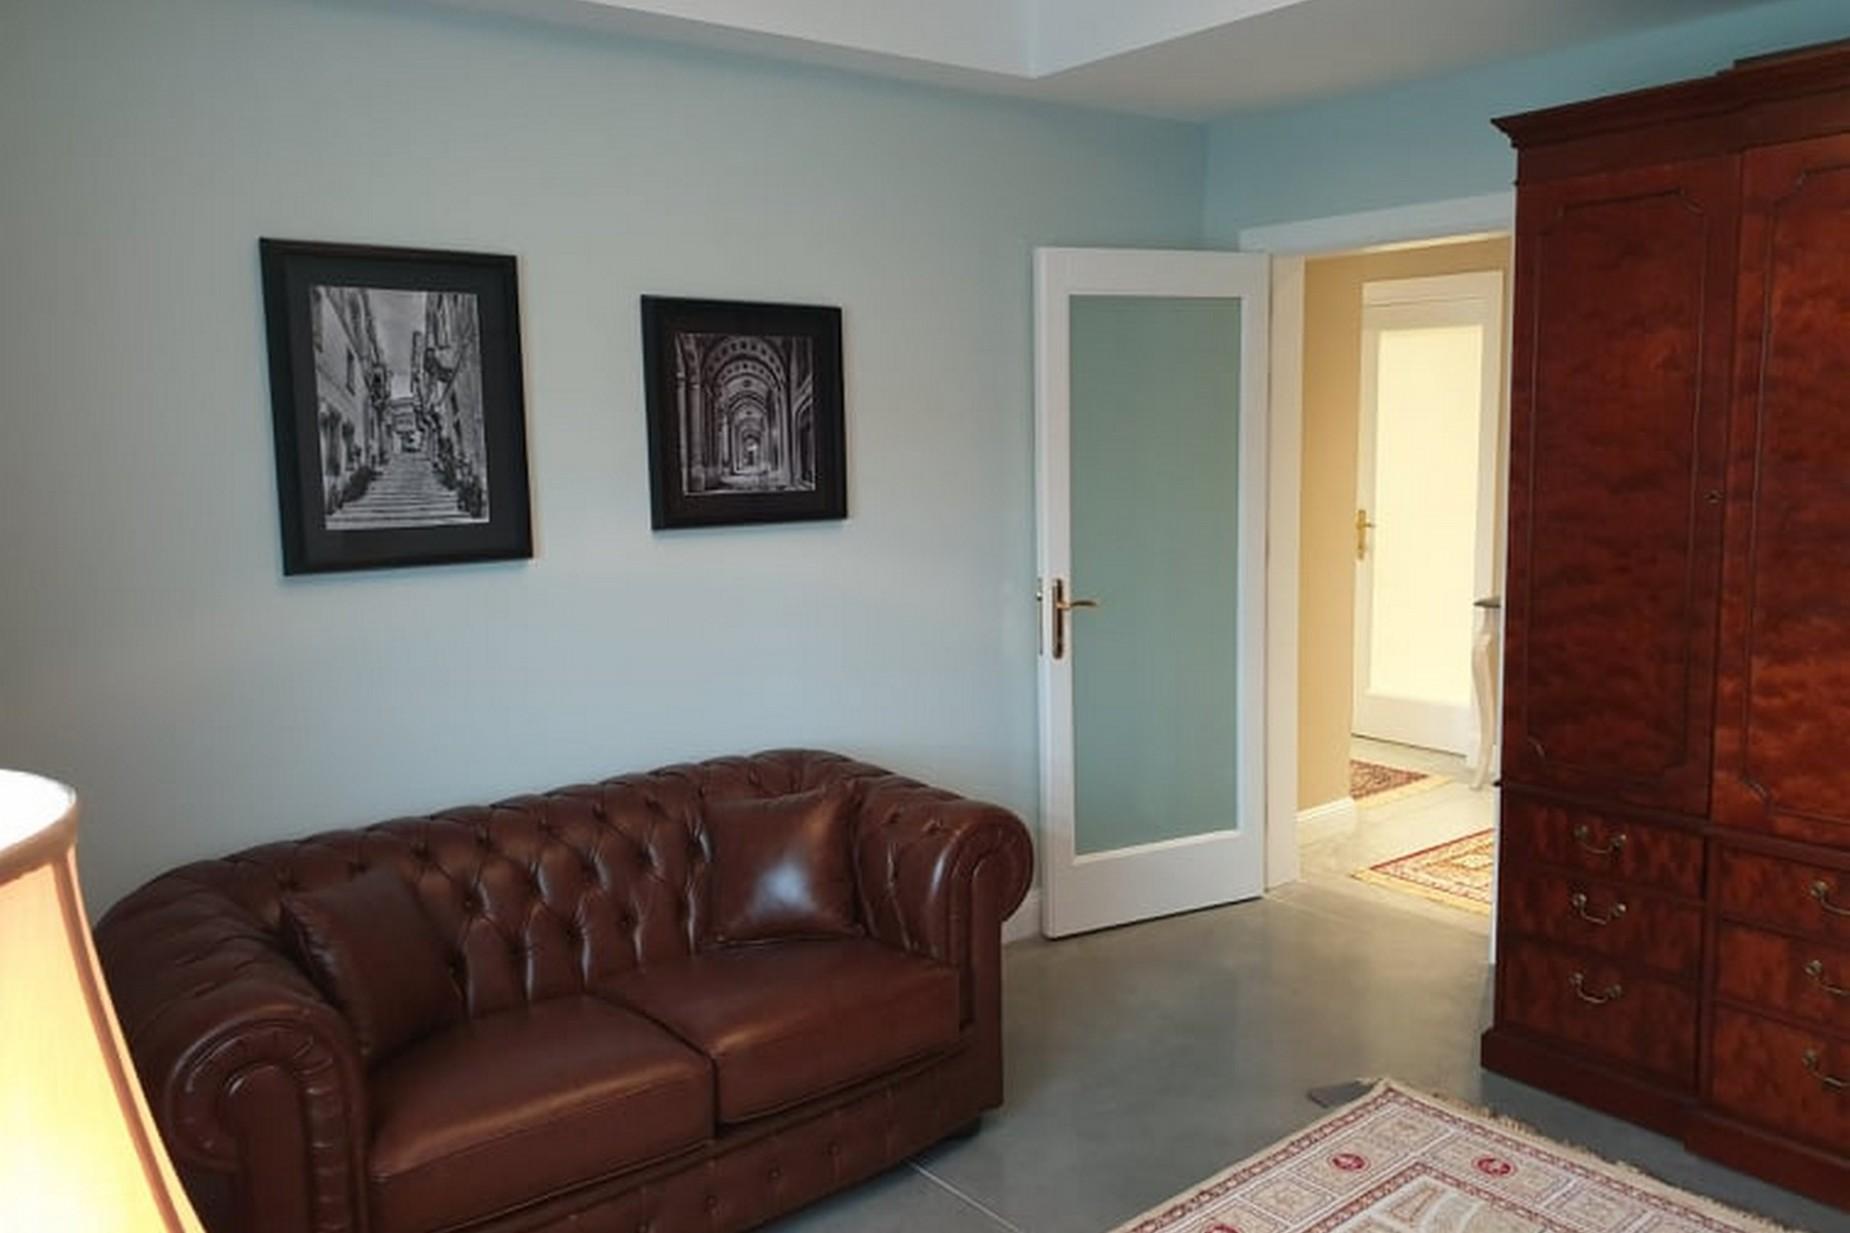 3 bed Apartment For Rent in Birkirkara, Birkirkara - thumb 22